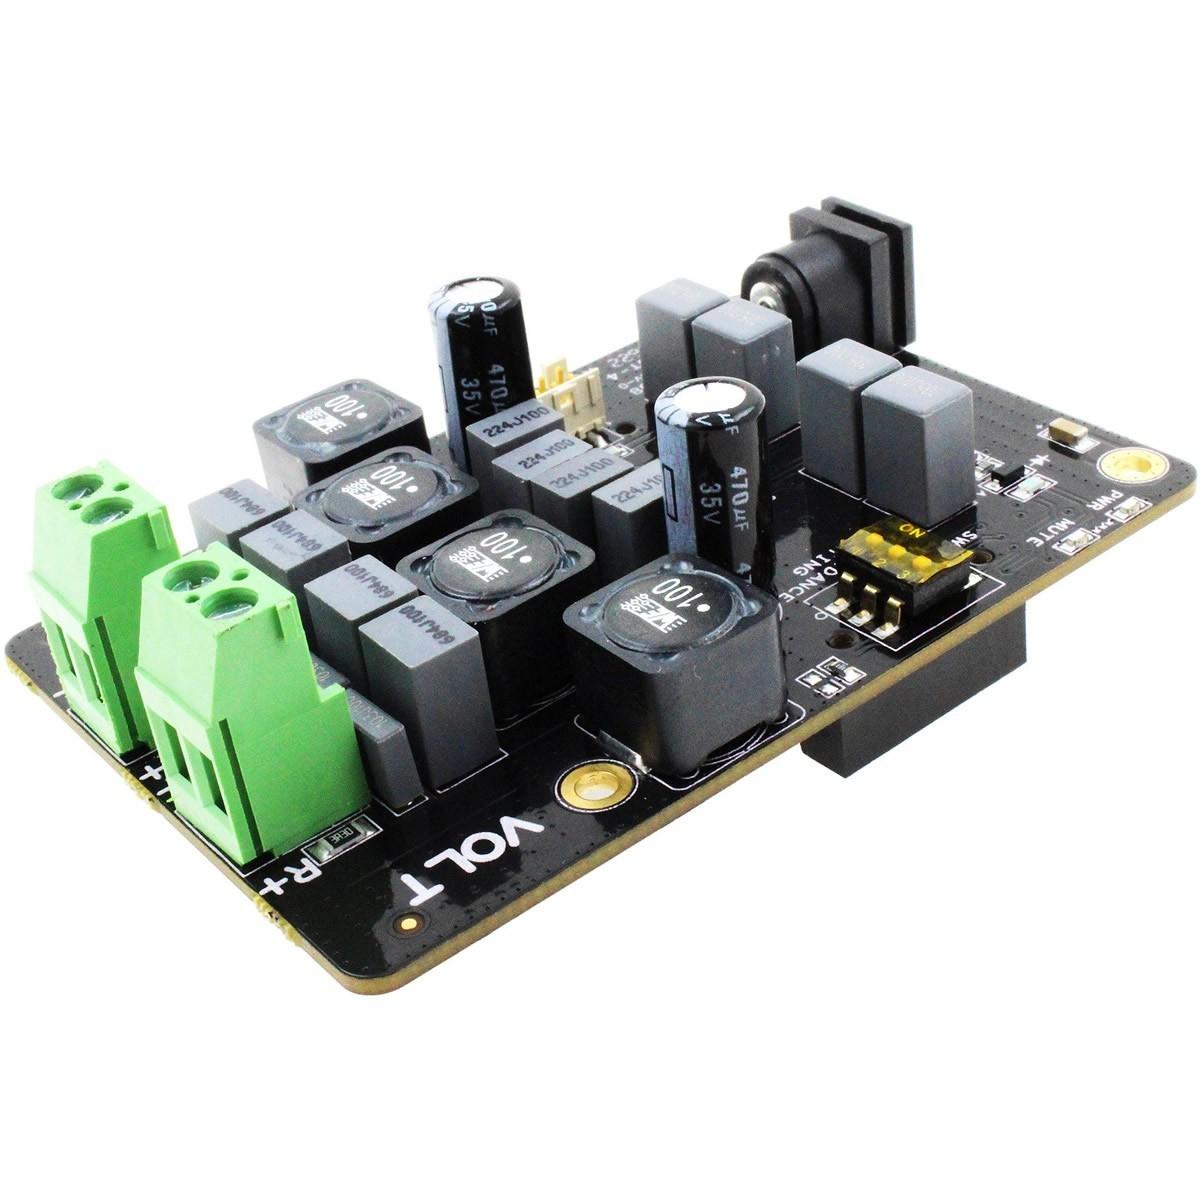 ALLO VOLT AMP Stereo Amplifier Module Class D TPA3118D2 2x25W / 8 Ohm